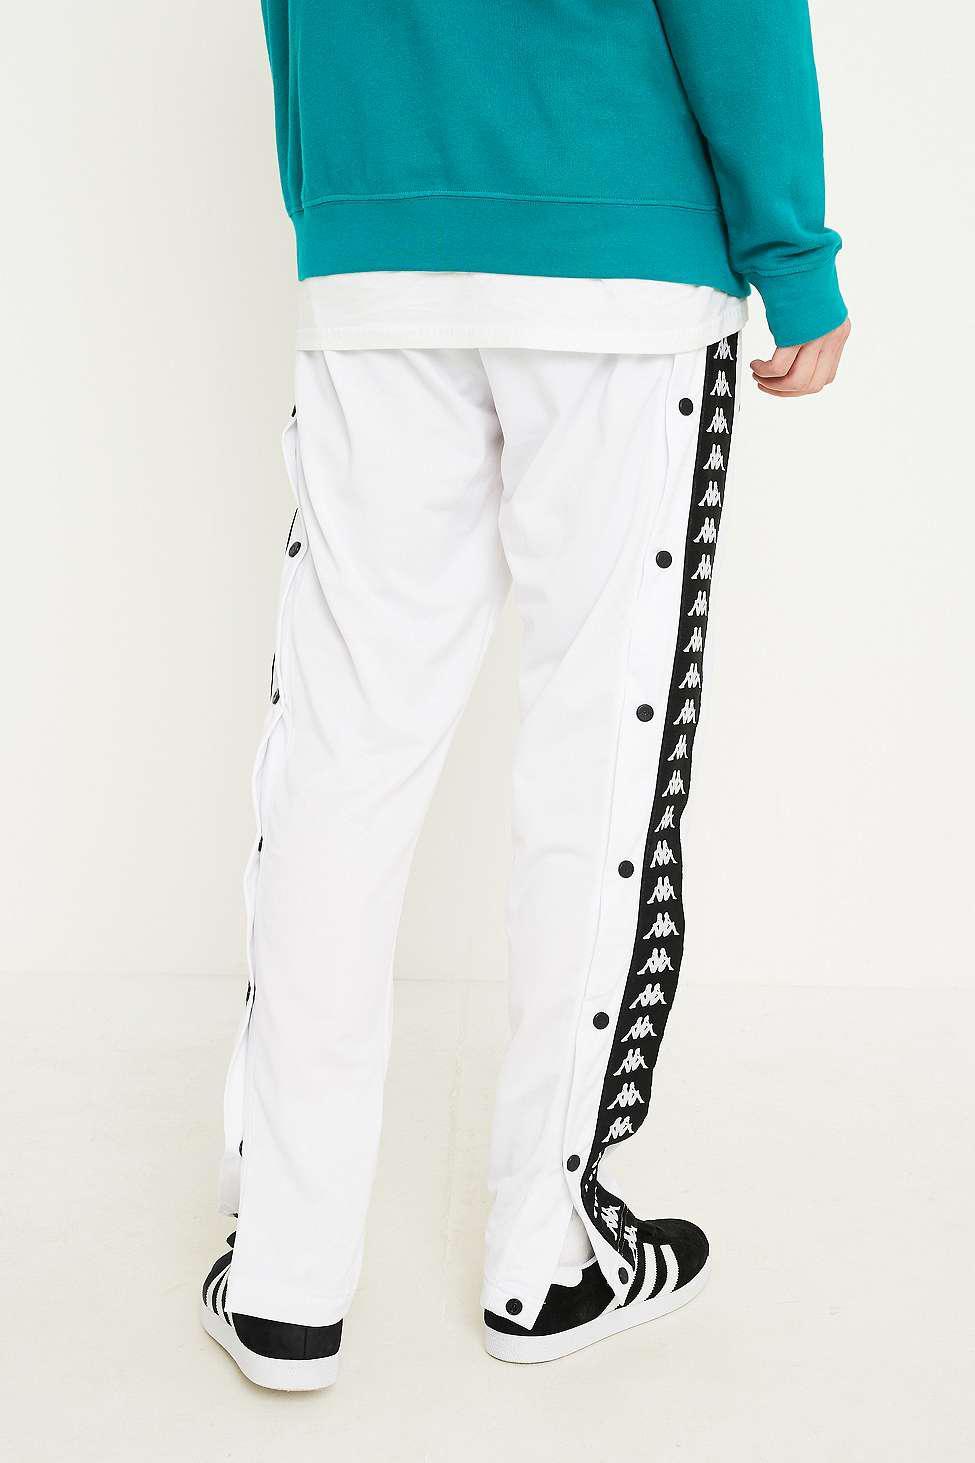 a011fb5f5e76 Kappa Slim White Popper Track Pants - Mens L in White for Men - Lyst